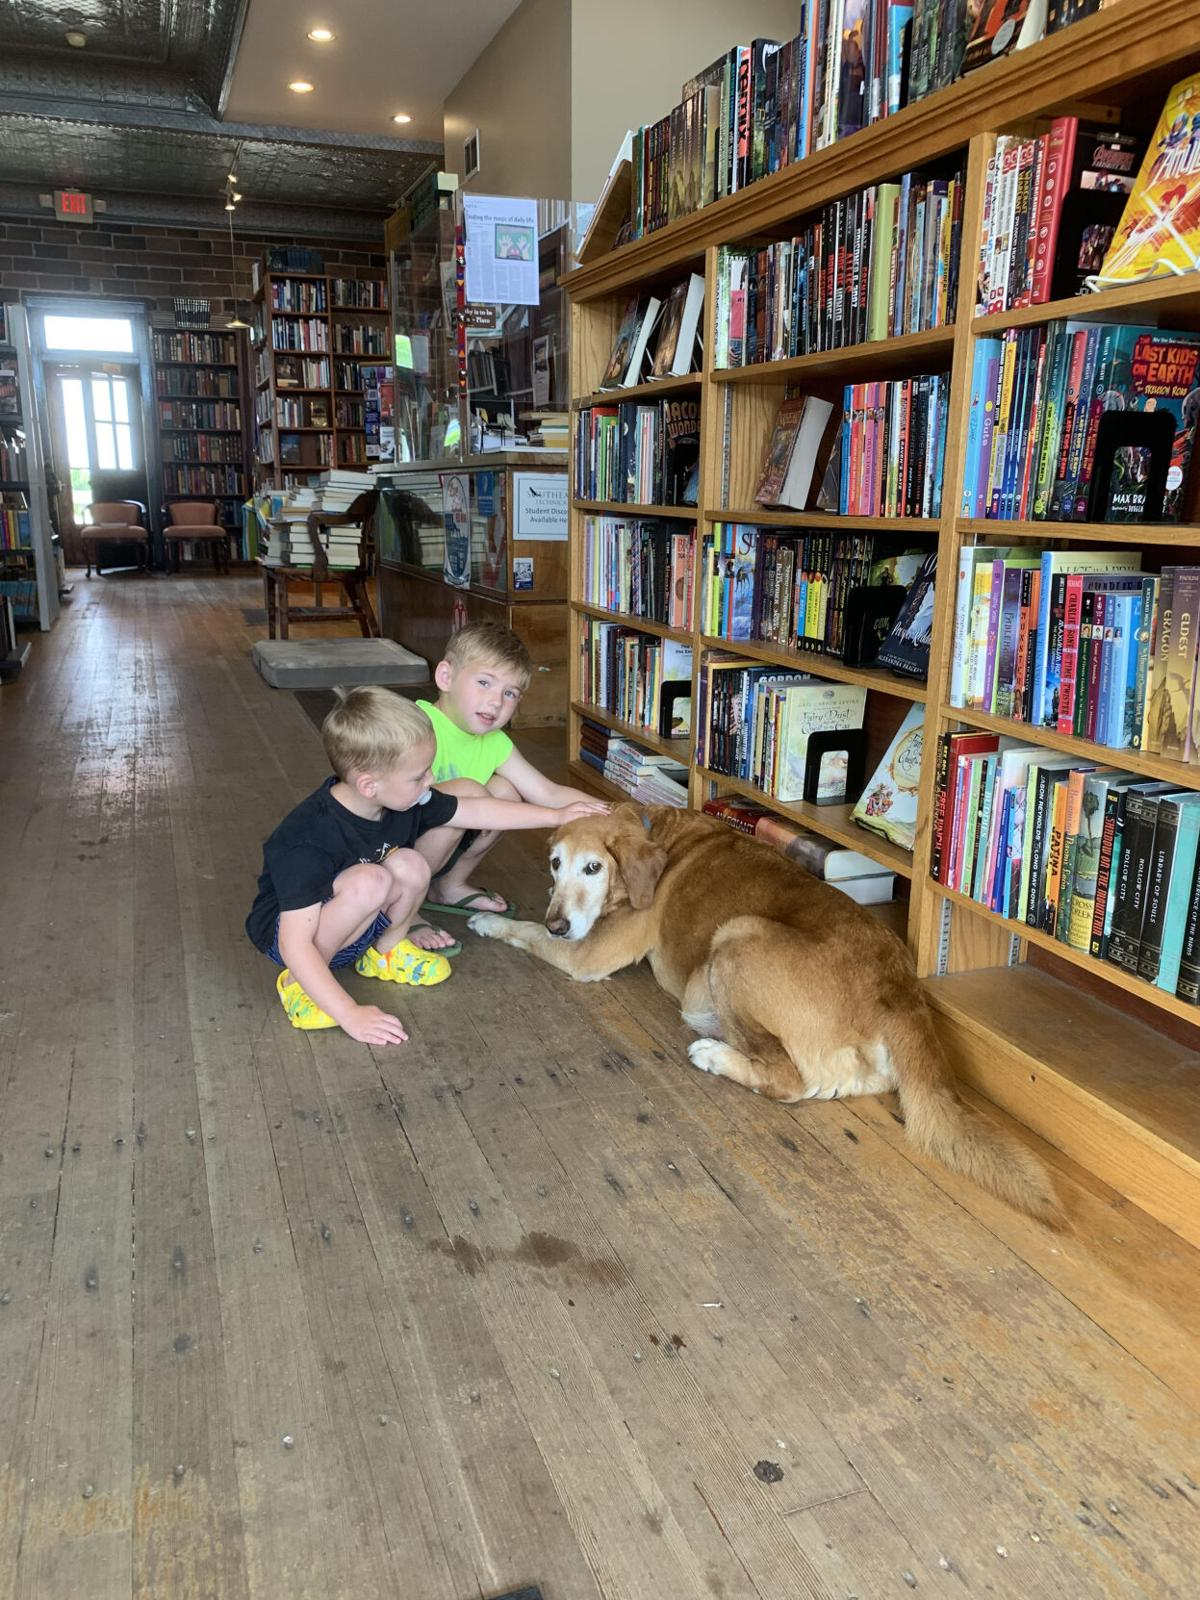 Fair Trade Books and dog